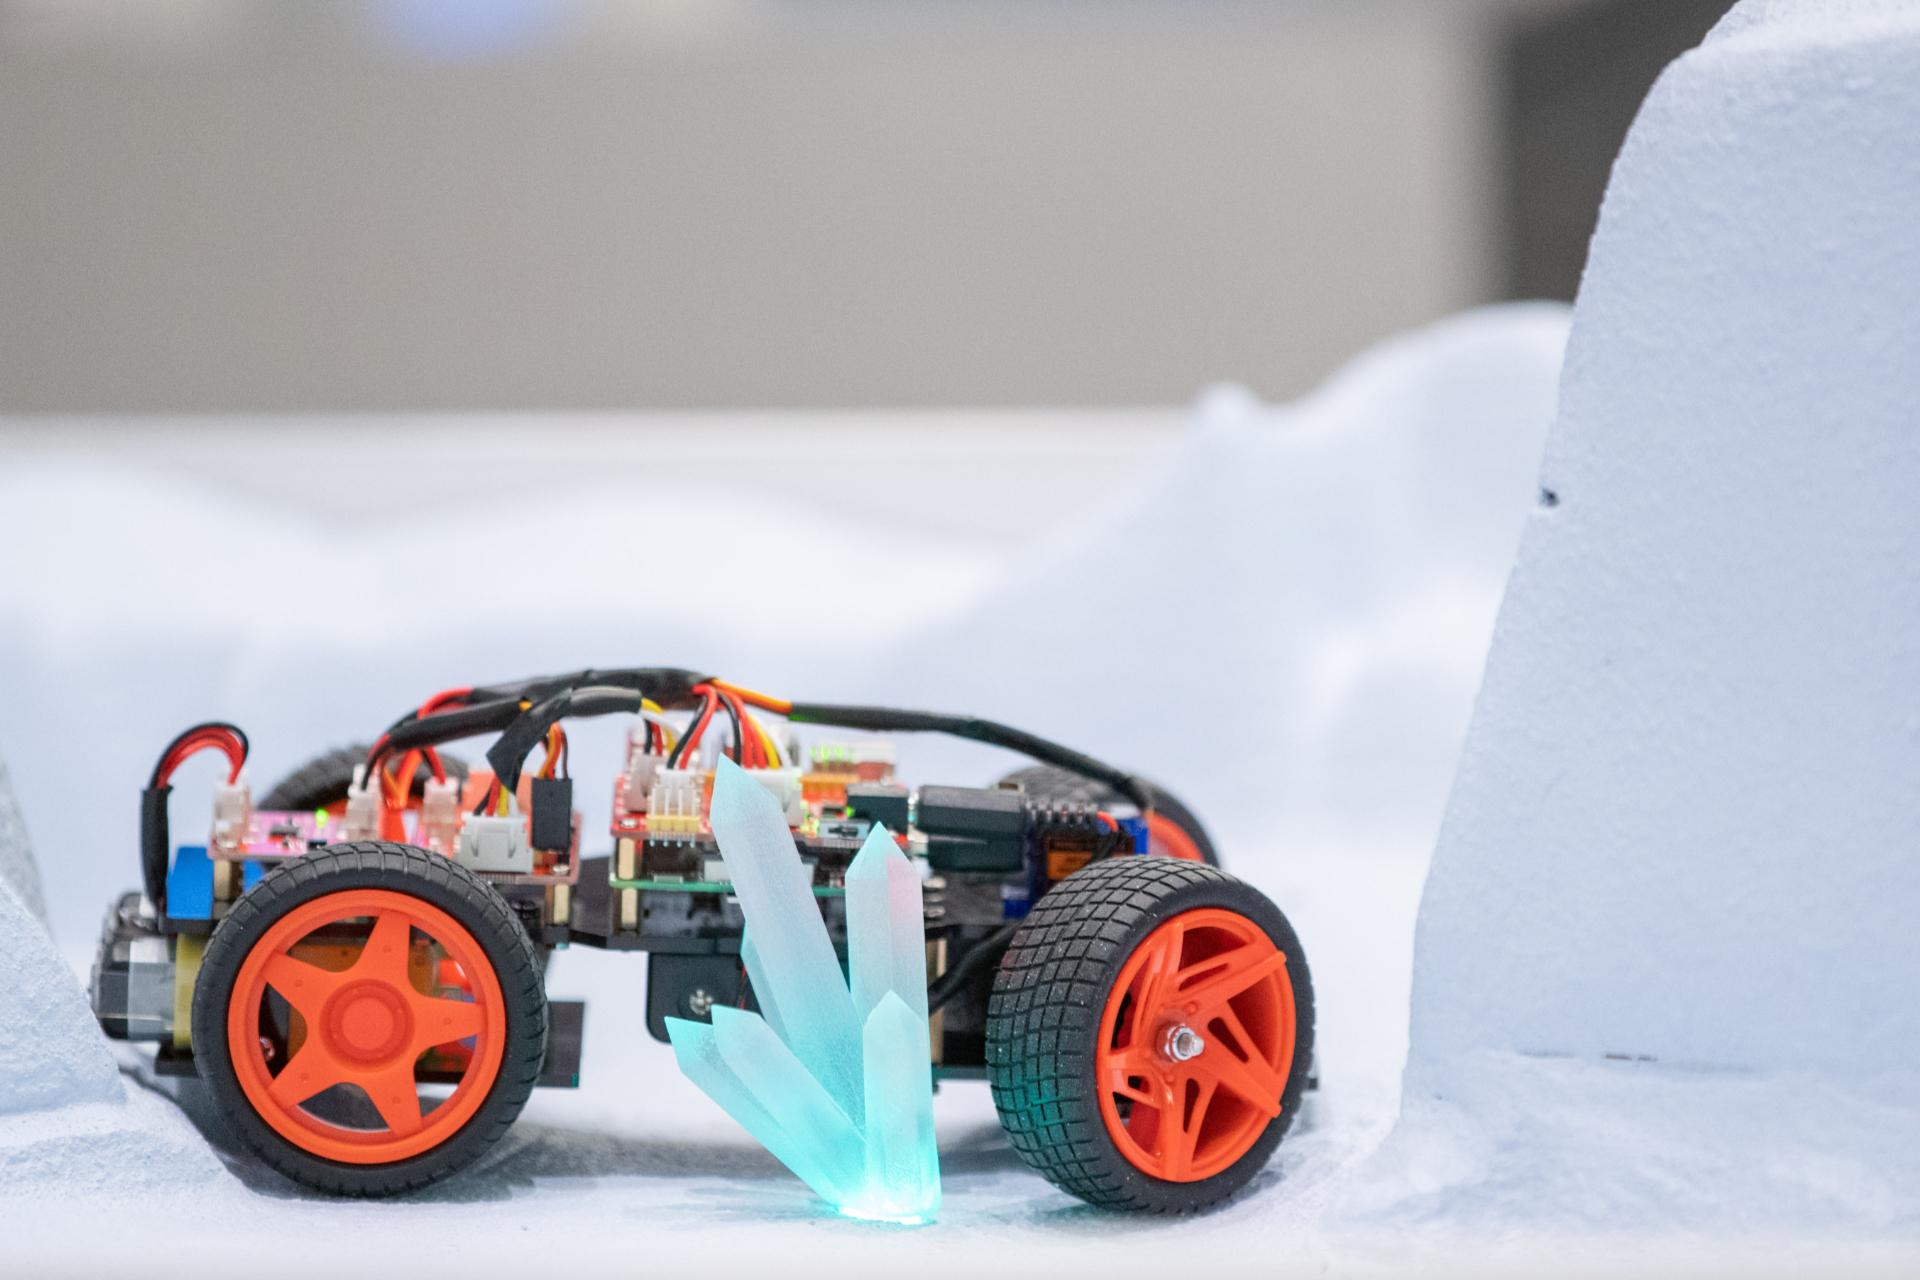 MongoDB Stitch Rover - Stitch Mobile Sync